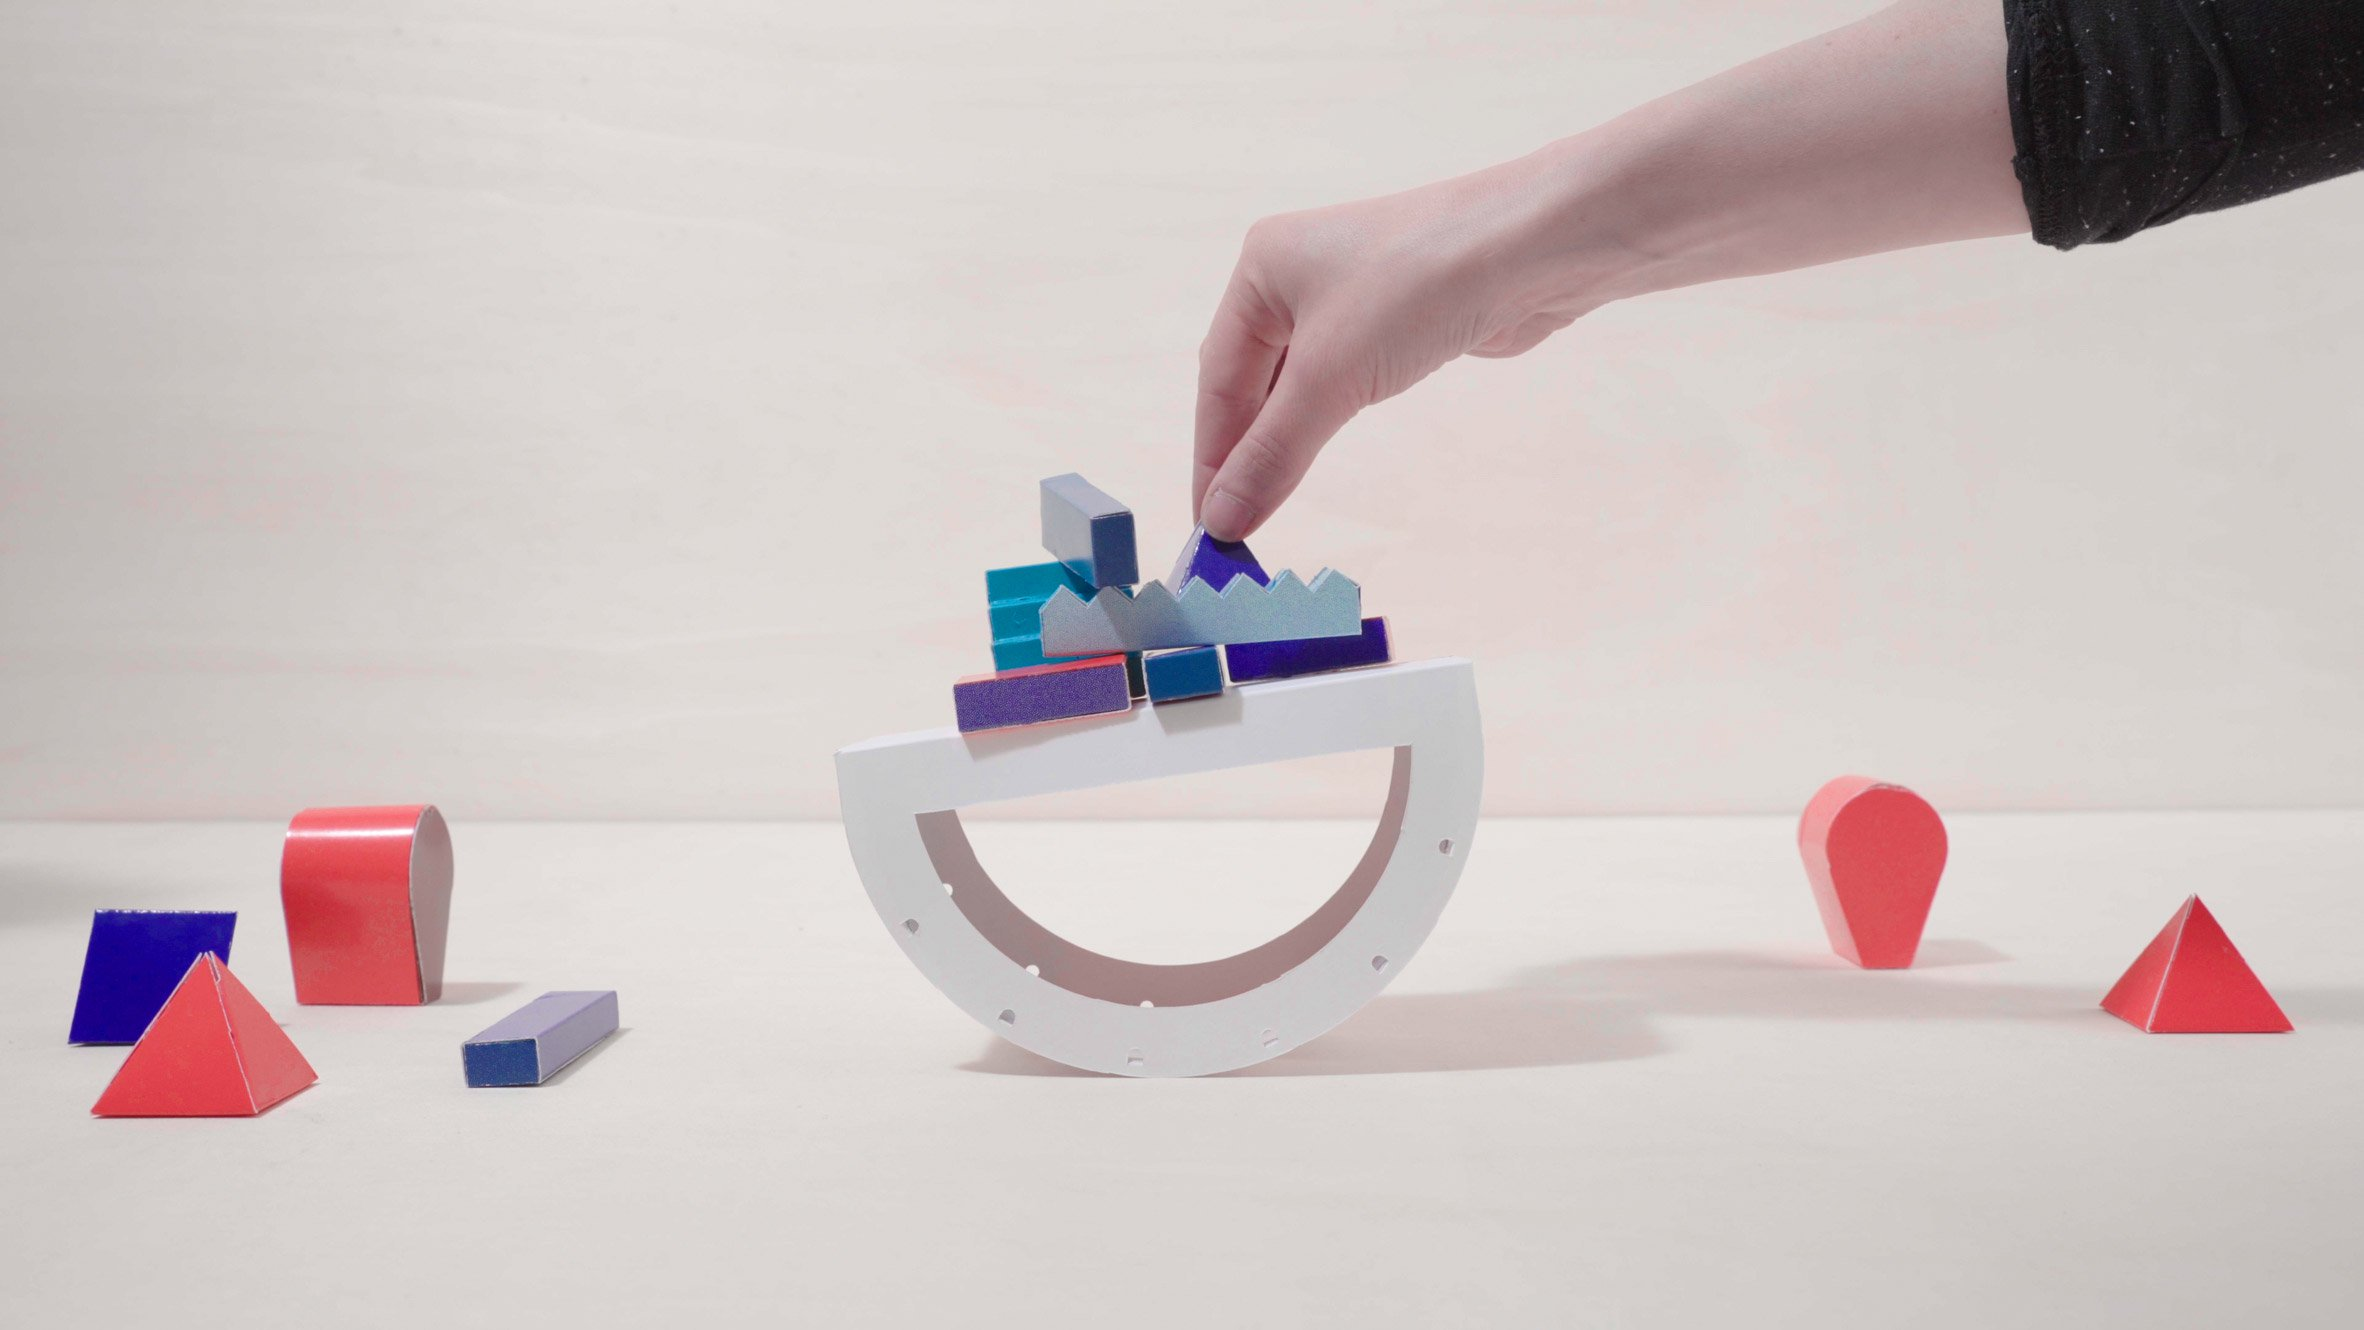 Papier Machine: ตัด แปะ พับ กระดาษให้เป็นของเล่นอิเล็กทรอนิกส์